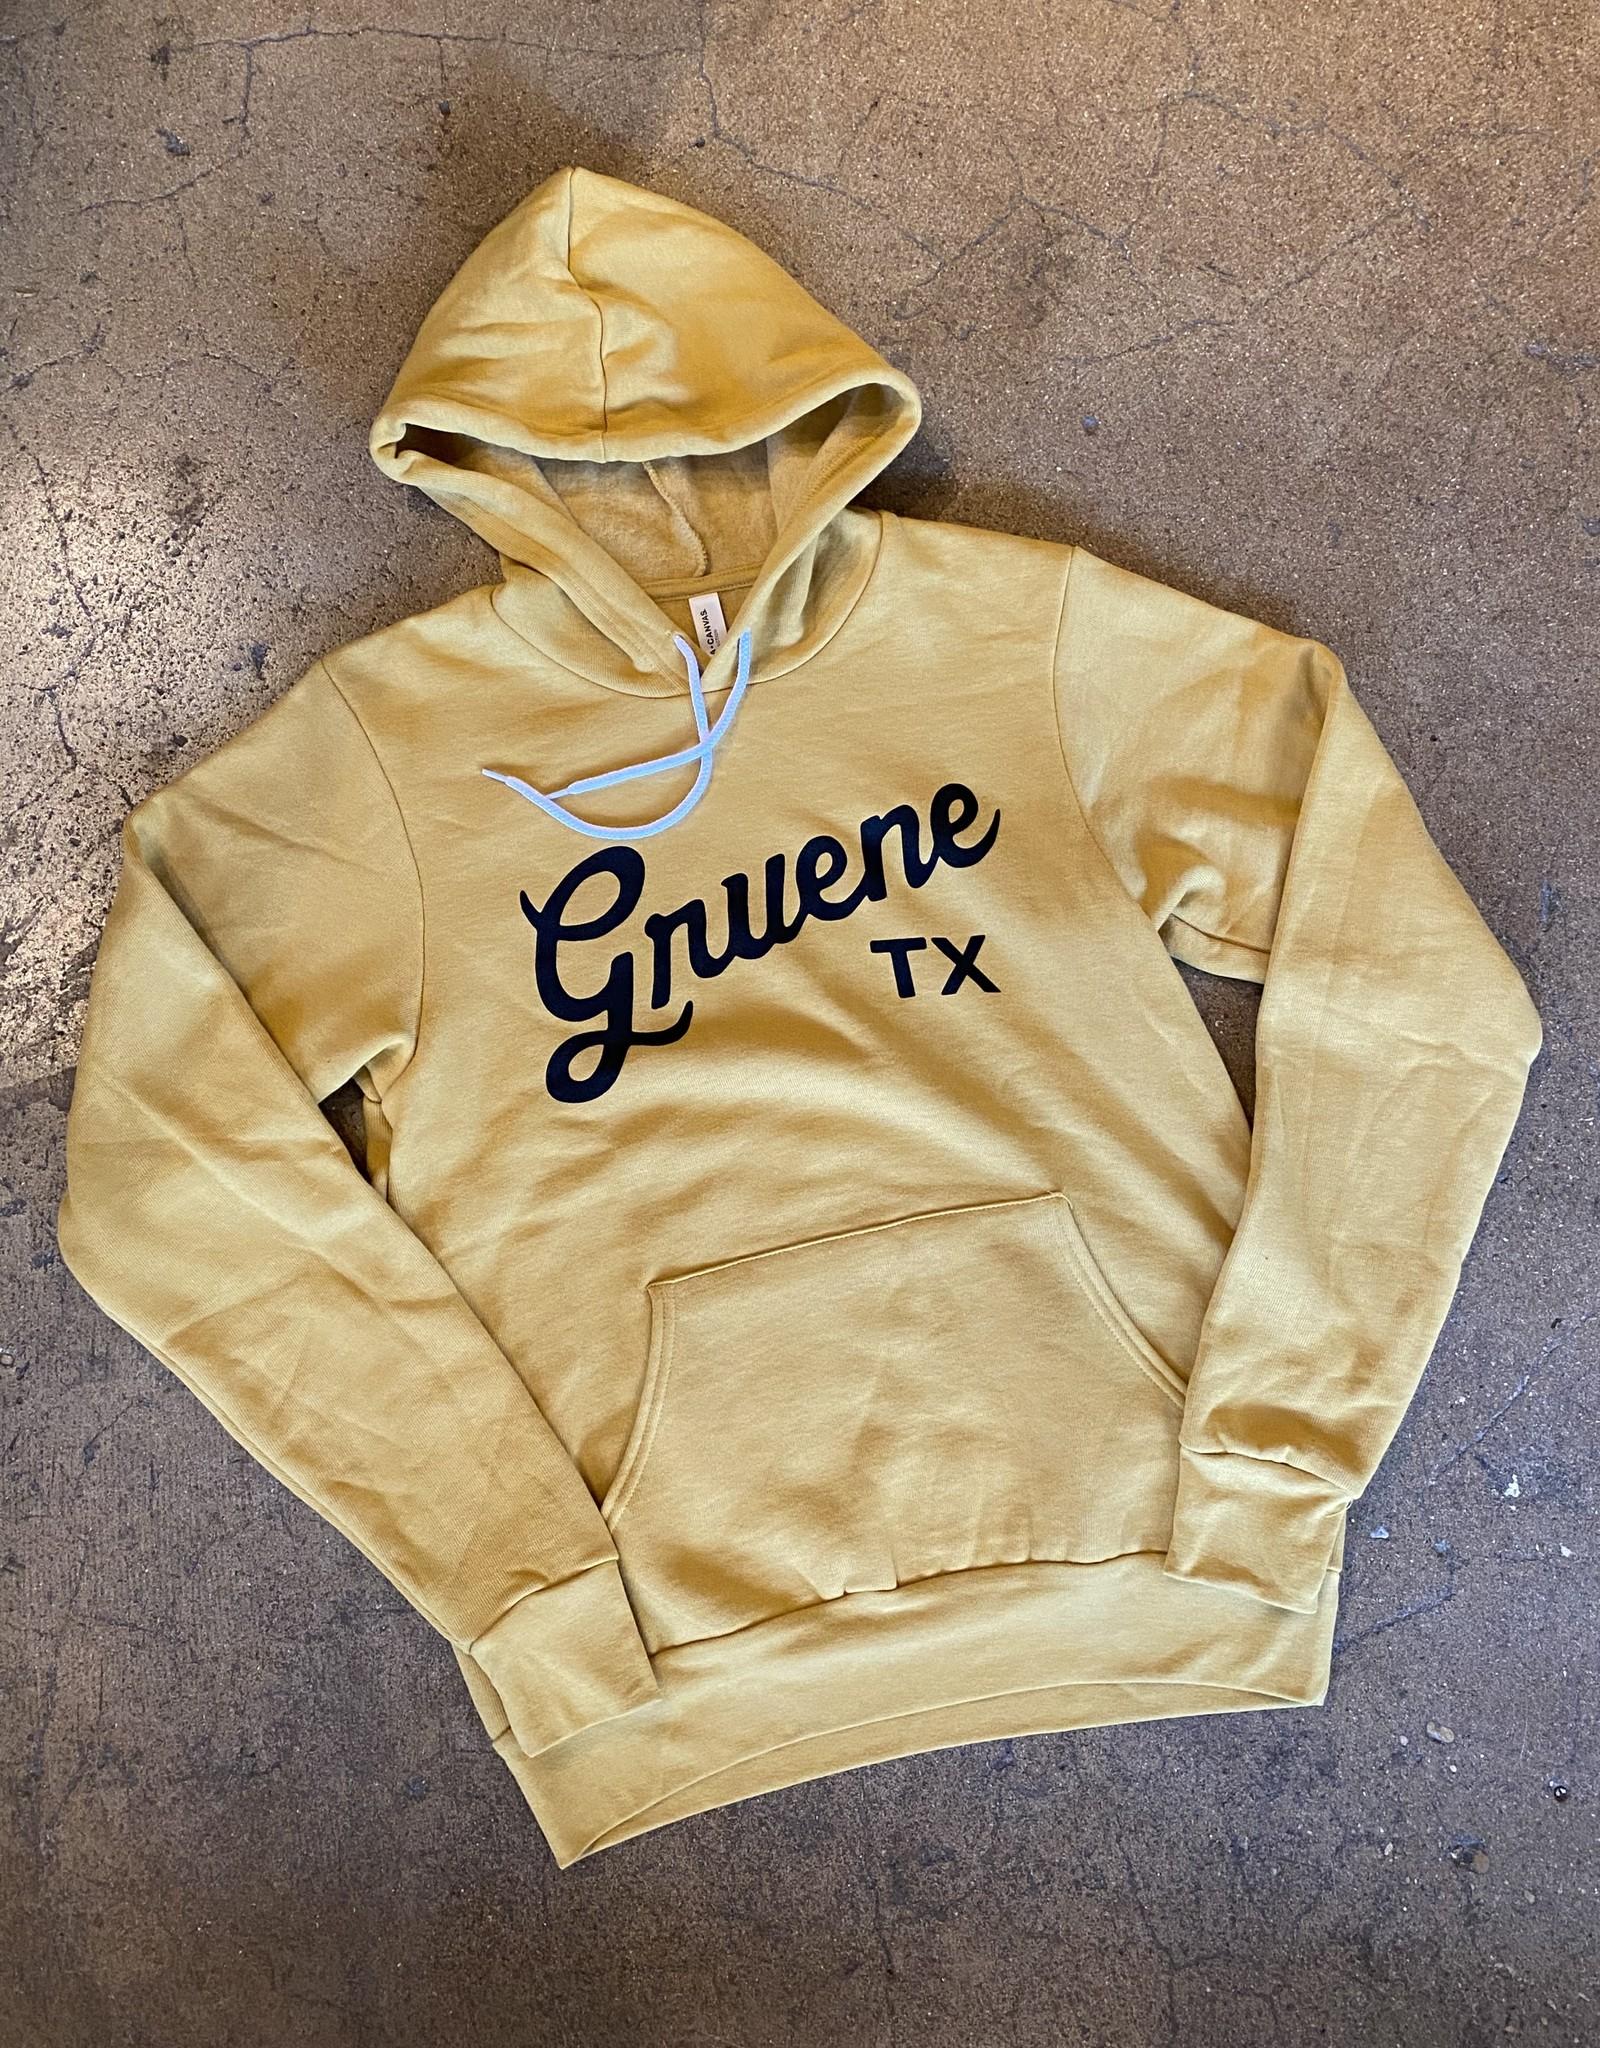 Gruene TX Hoodie